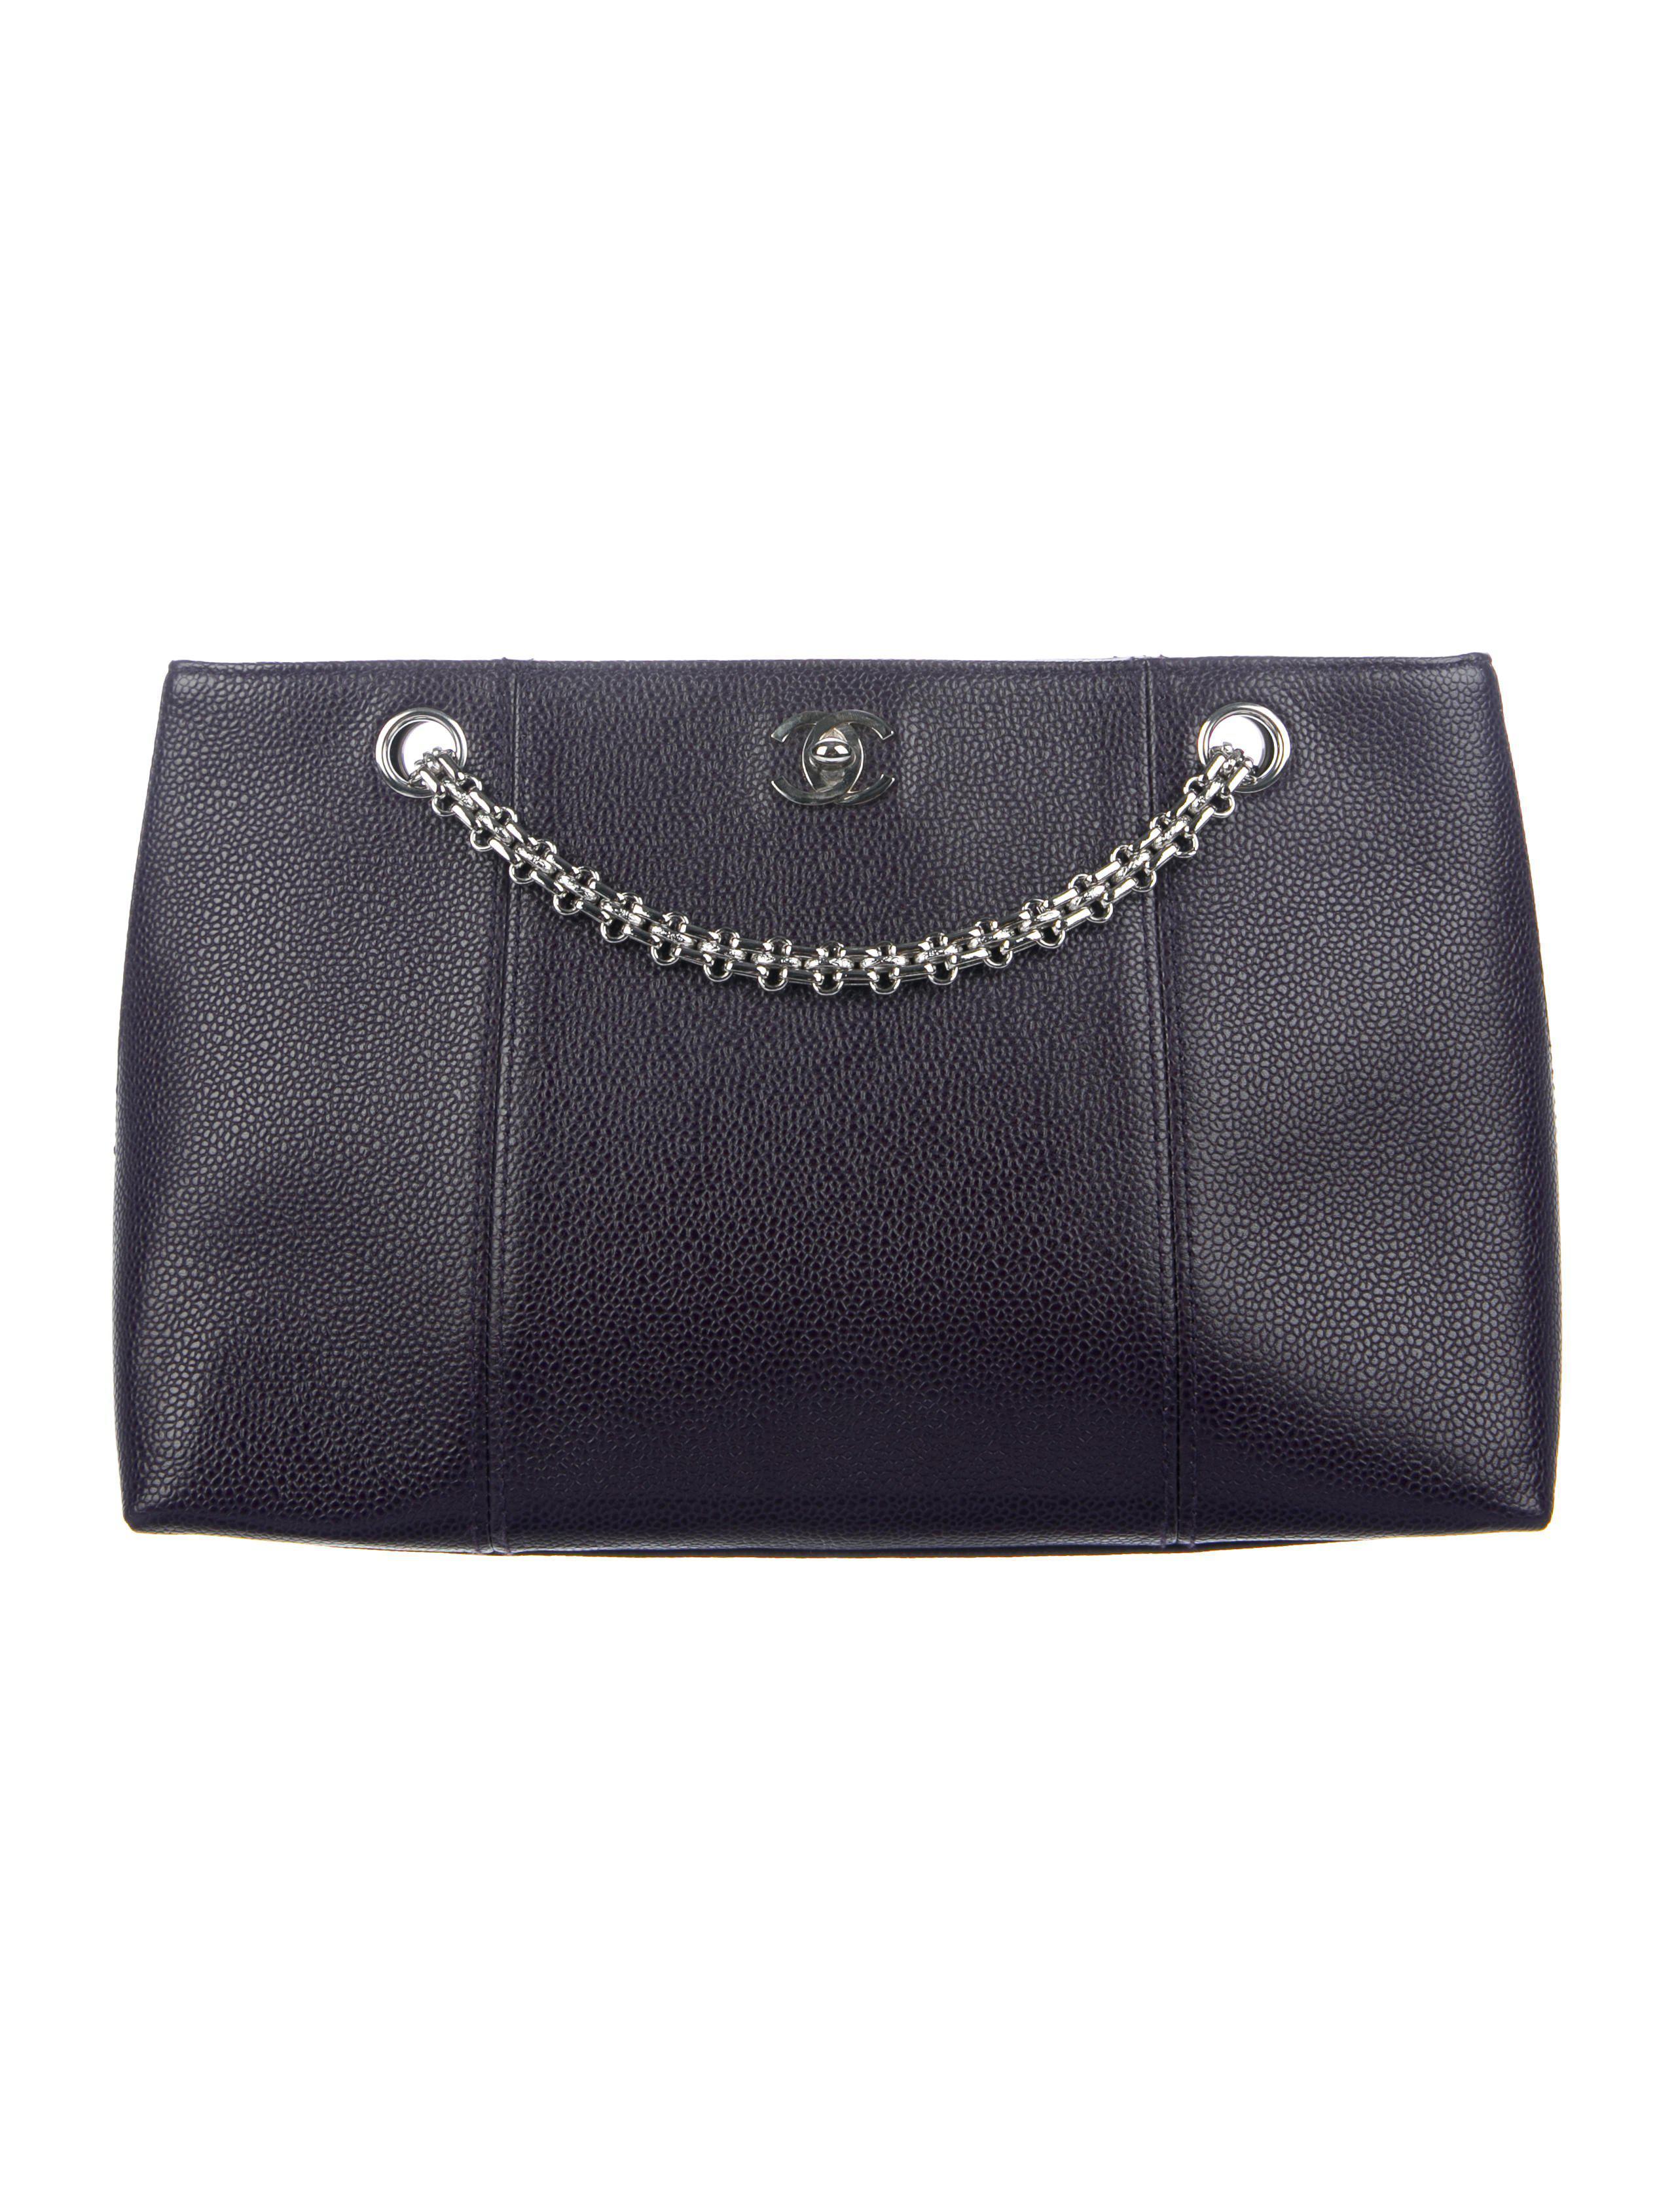 c77327ea7629 Lyst - Chanel Reissue Chain Shoulder Bag Purple in Metallic